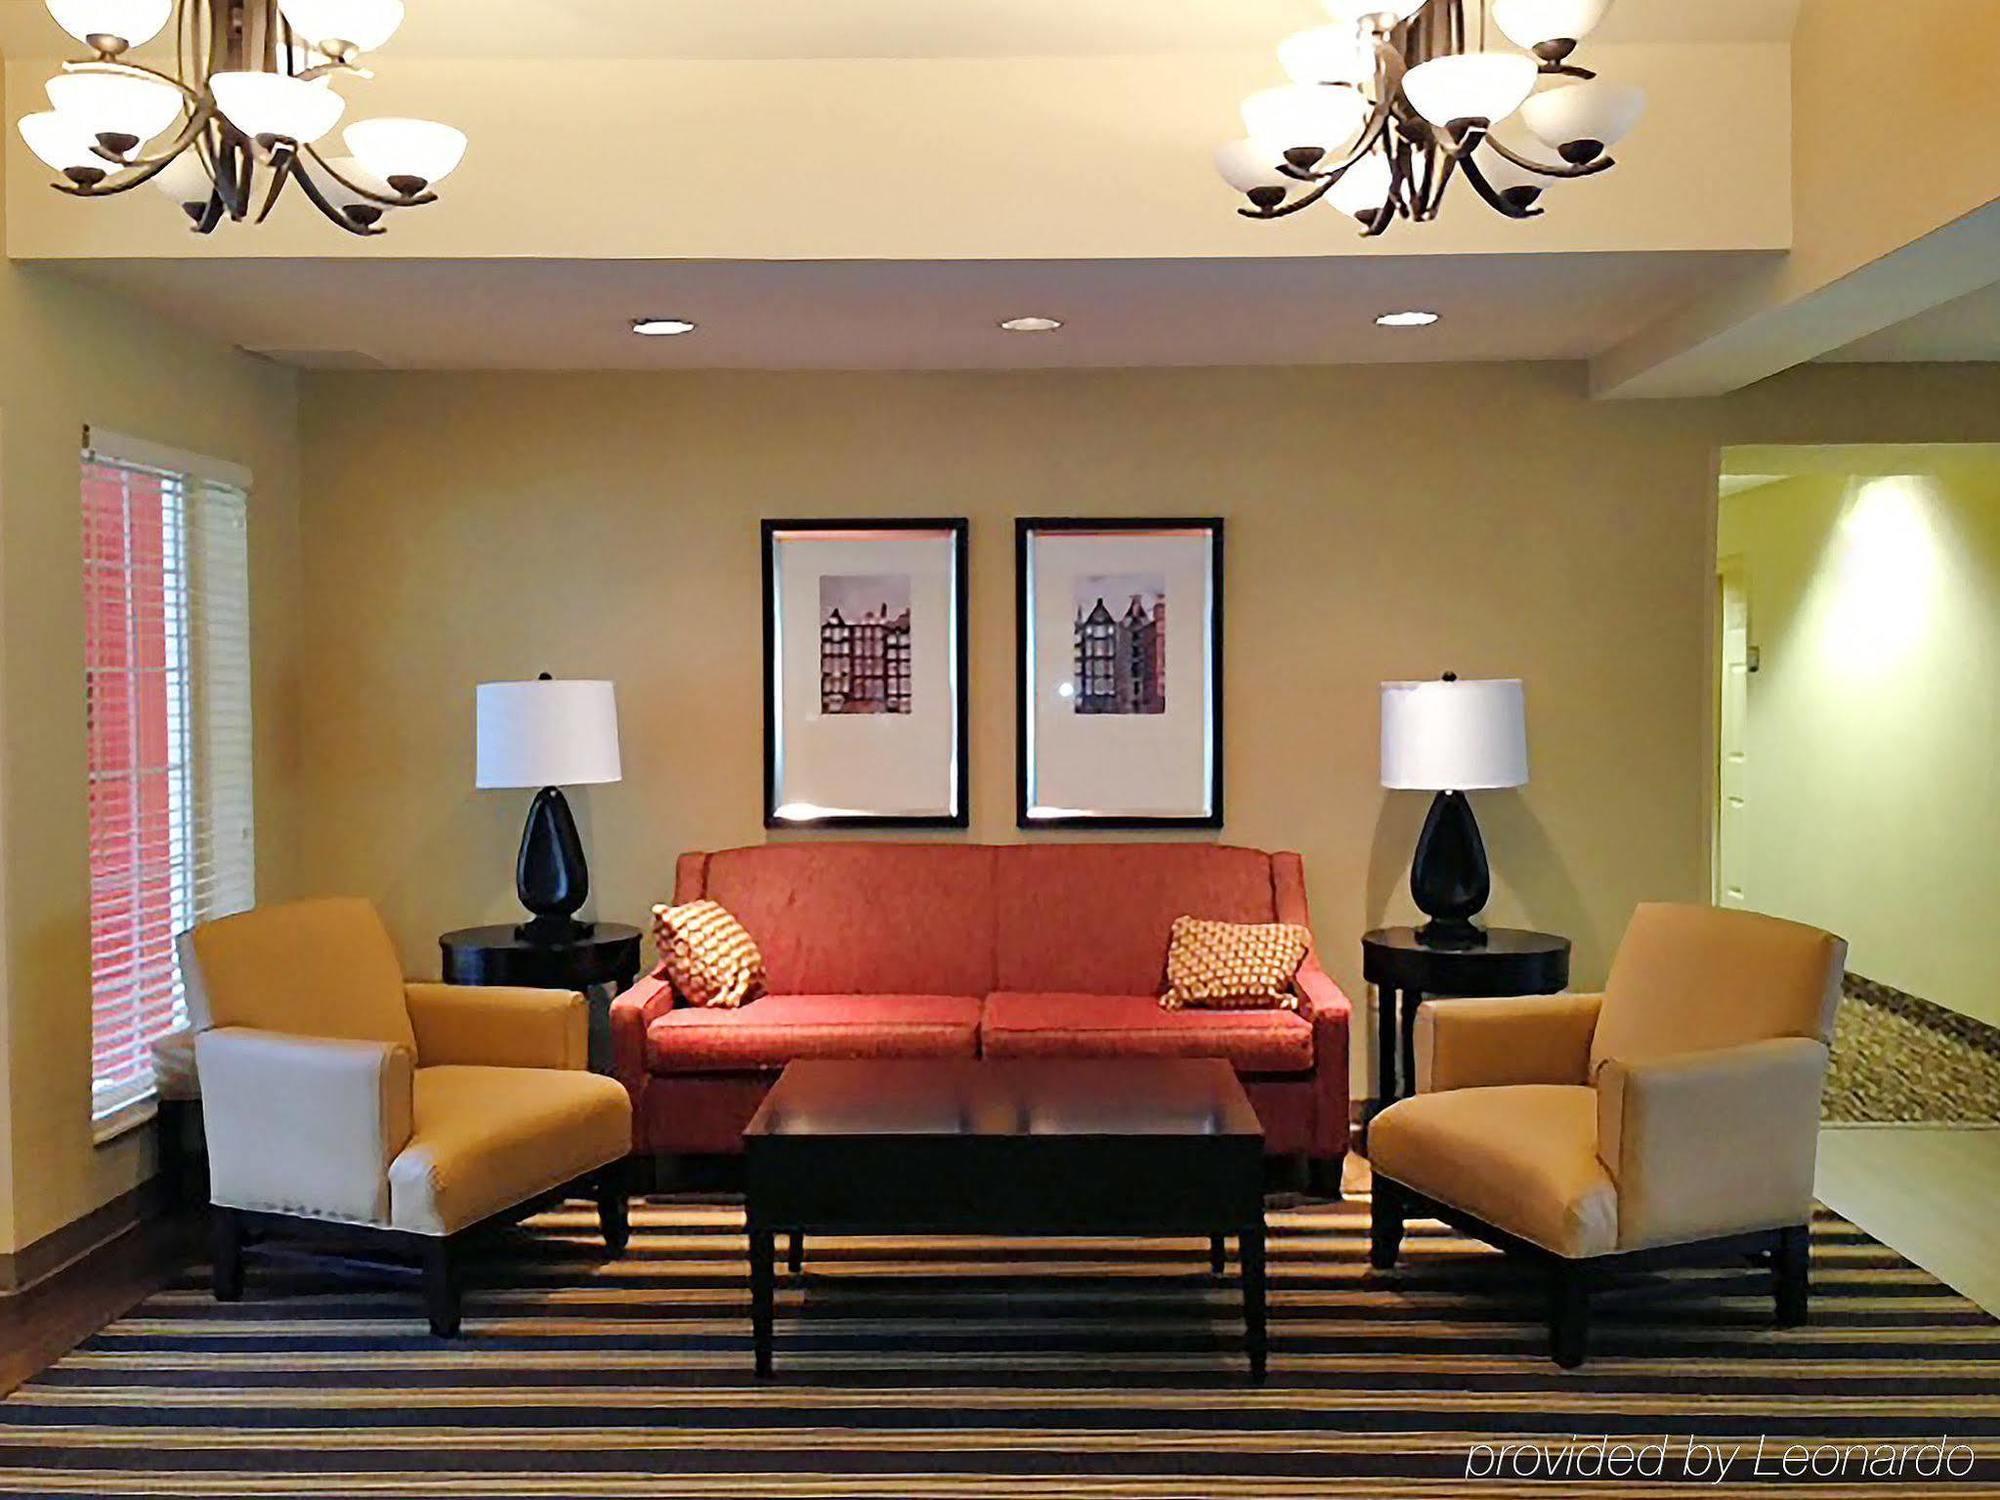 HOTEL EXTENDED STAY AMERICA - FISHKILL - ROUTE 9, FISHKILL **